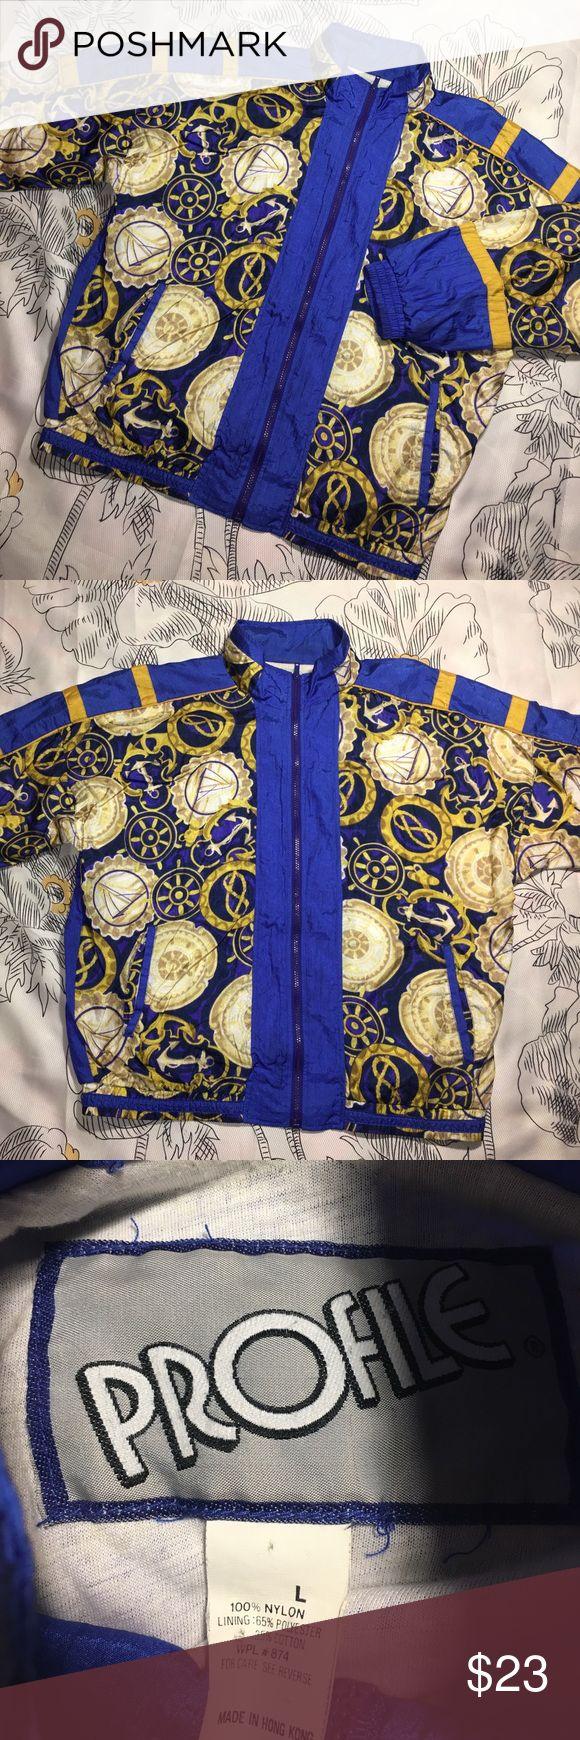 Vintage Retro Versace style Windbreaker Jacket Size Large - excellent vintage jacket profile Jackets & Coats Windbreakers